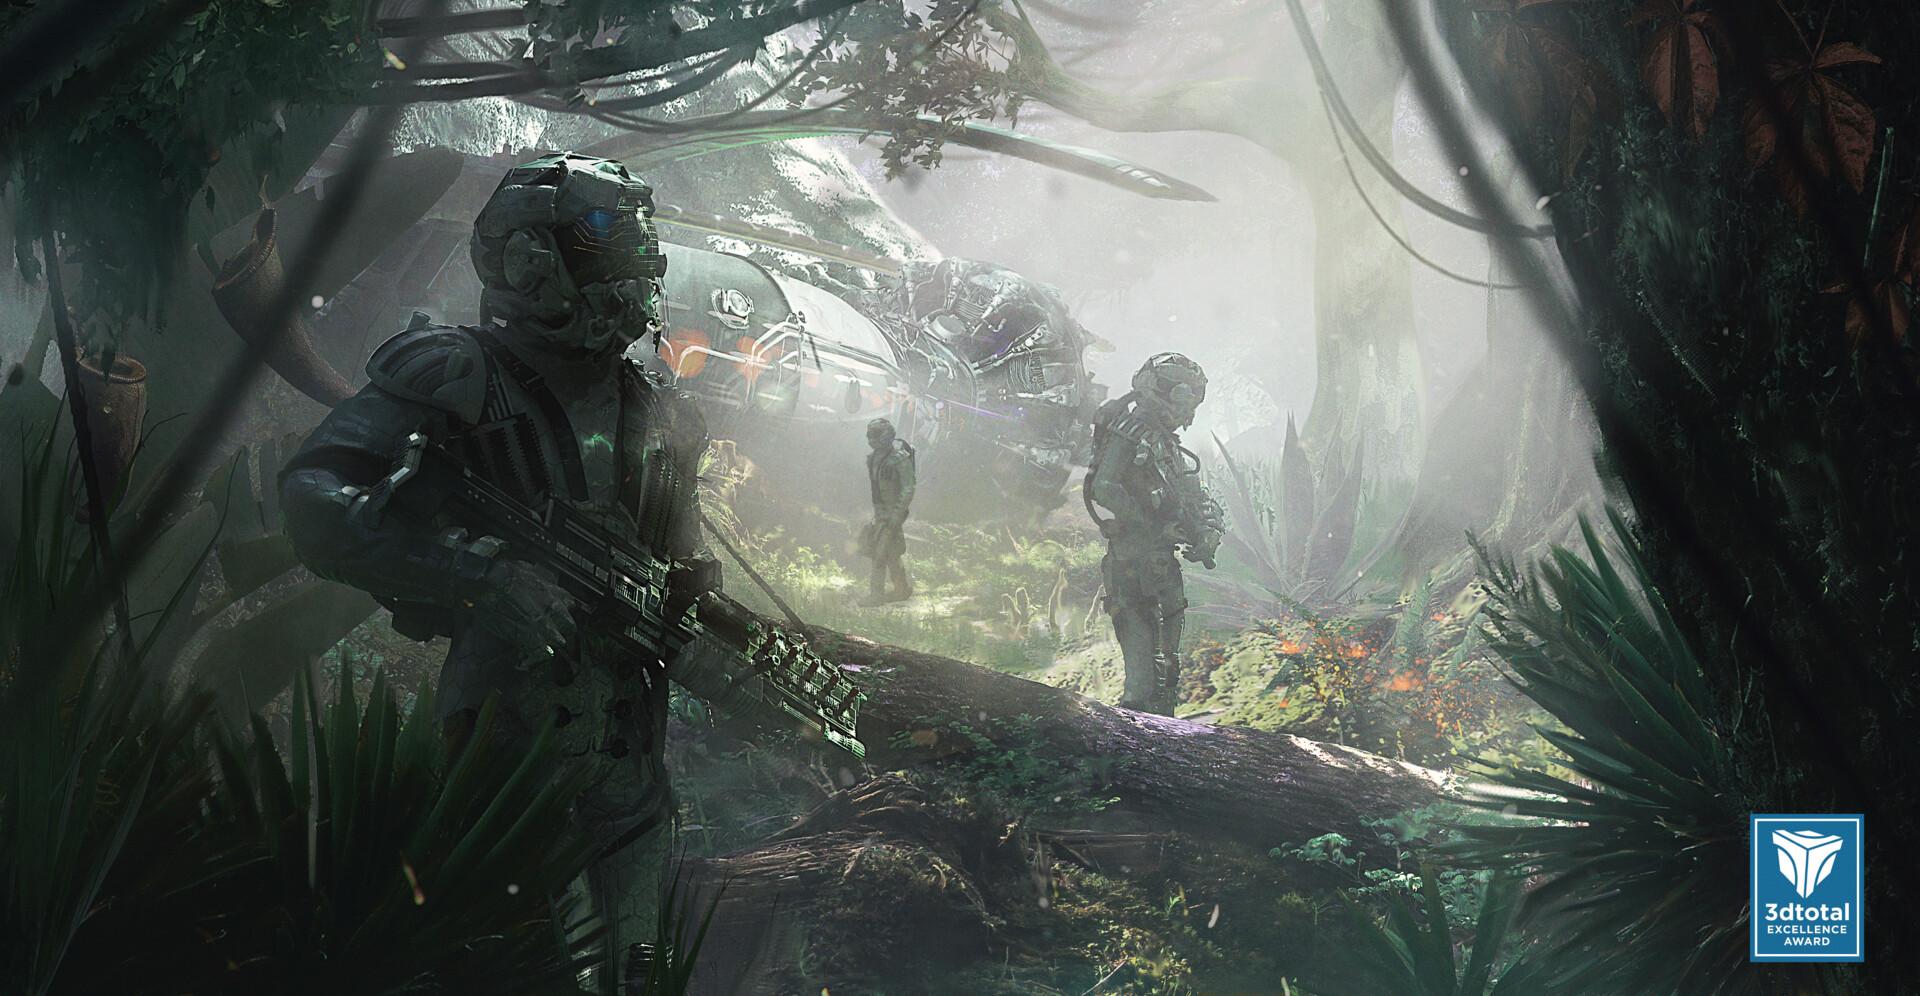 Helen ilnytska way through the jungle